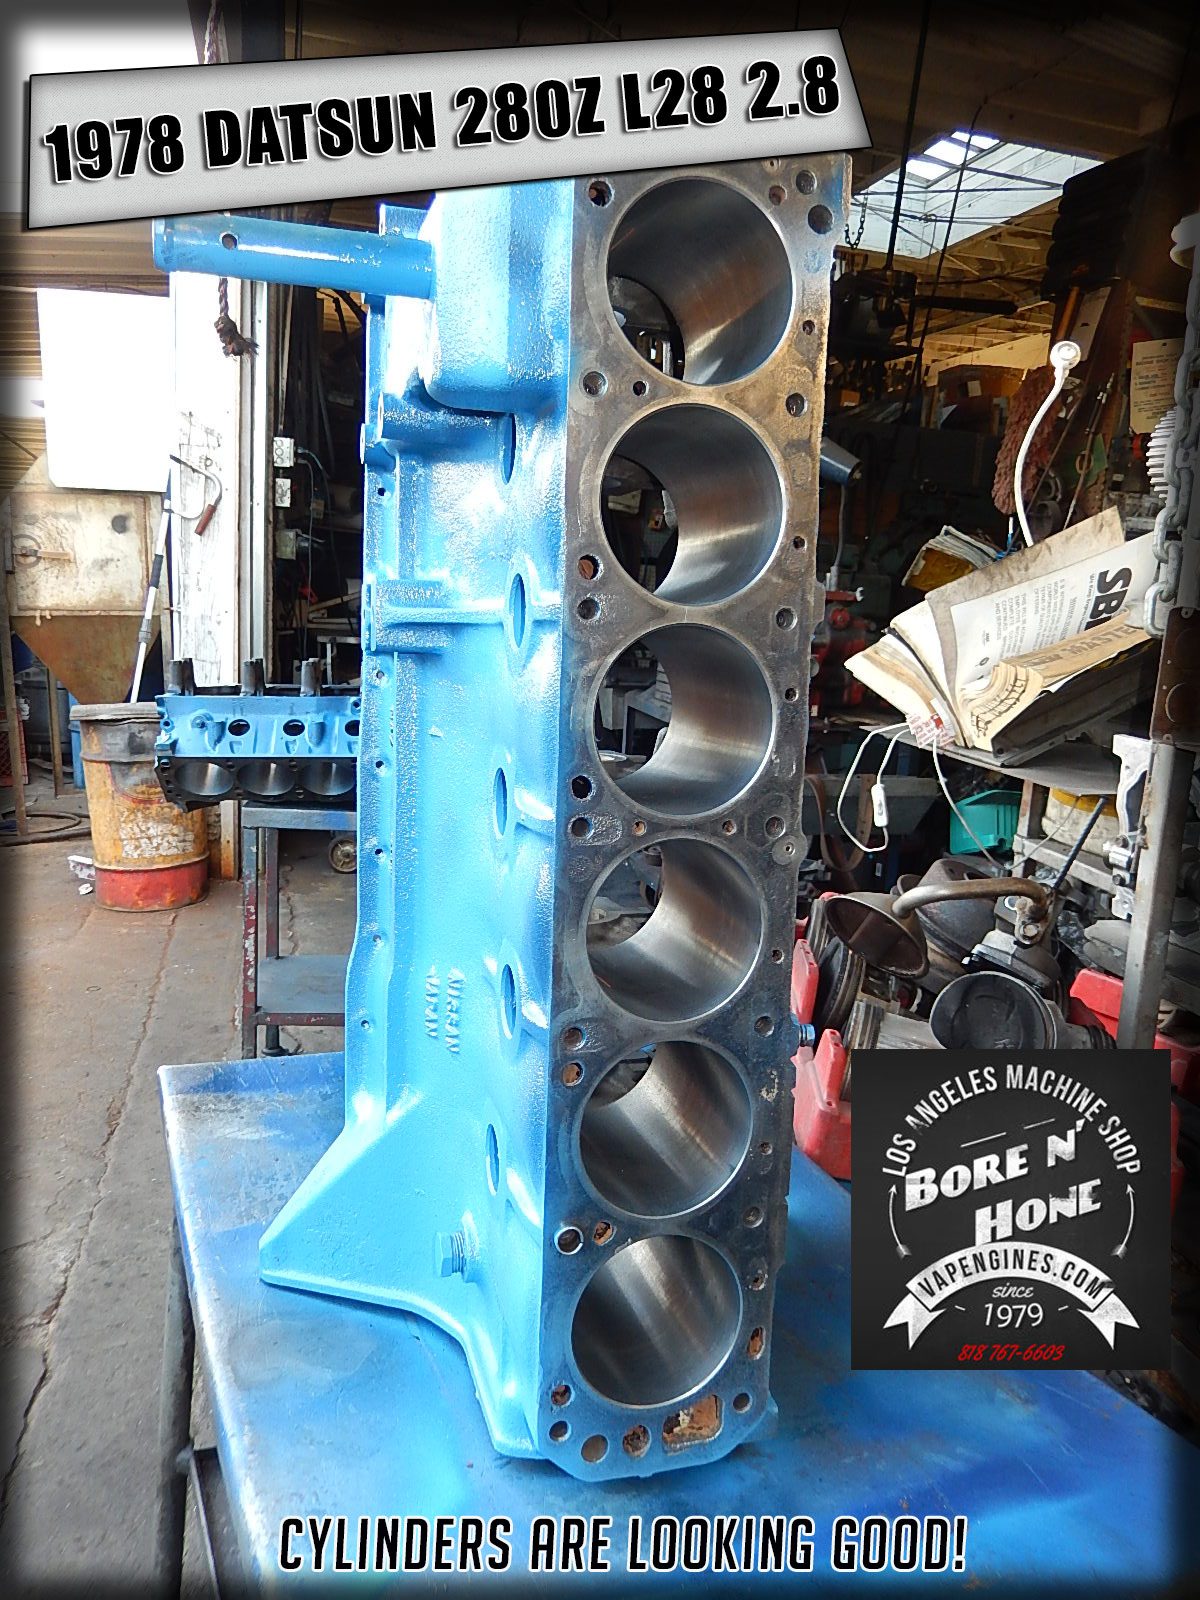 78 datsun 280z 2 8 remanufactured short block los angeles machine Datsun 280Z Parts bore n honed datsun 280z engine block